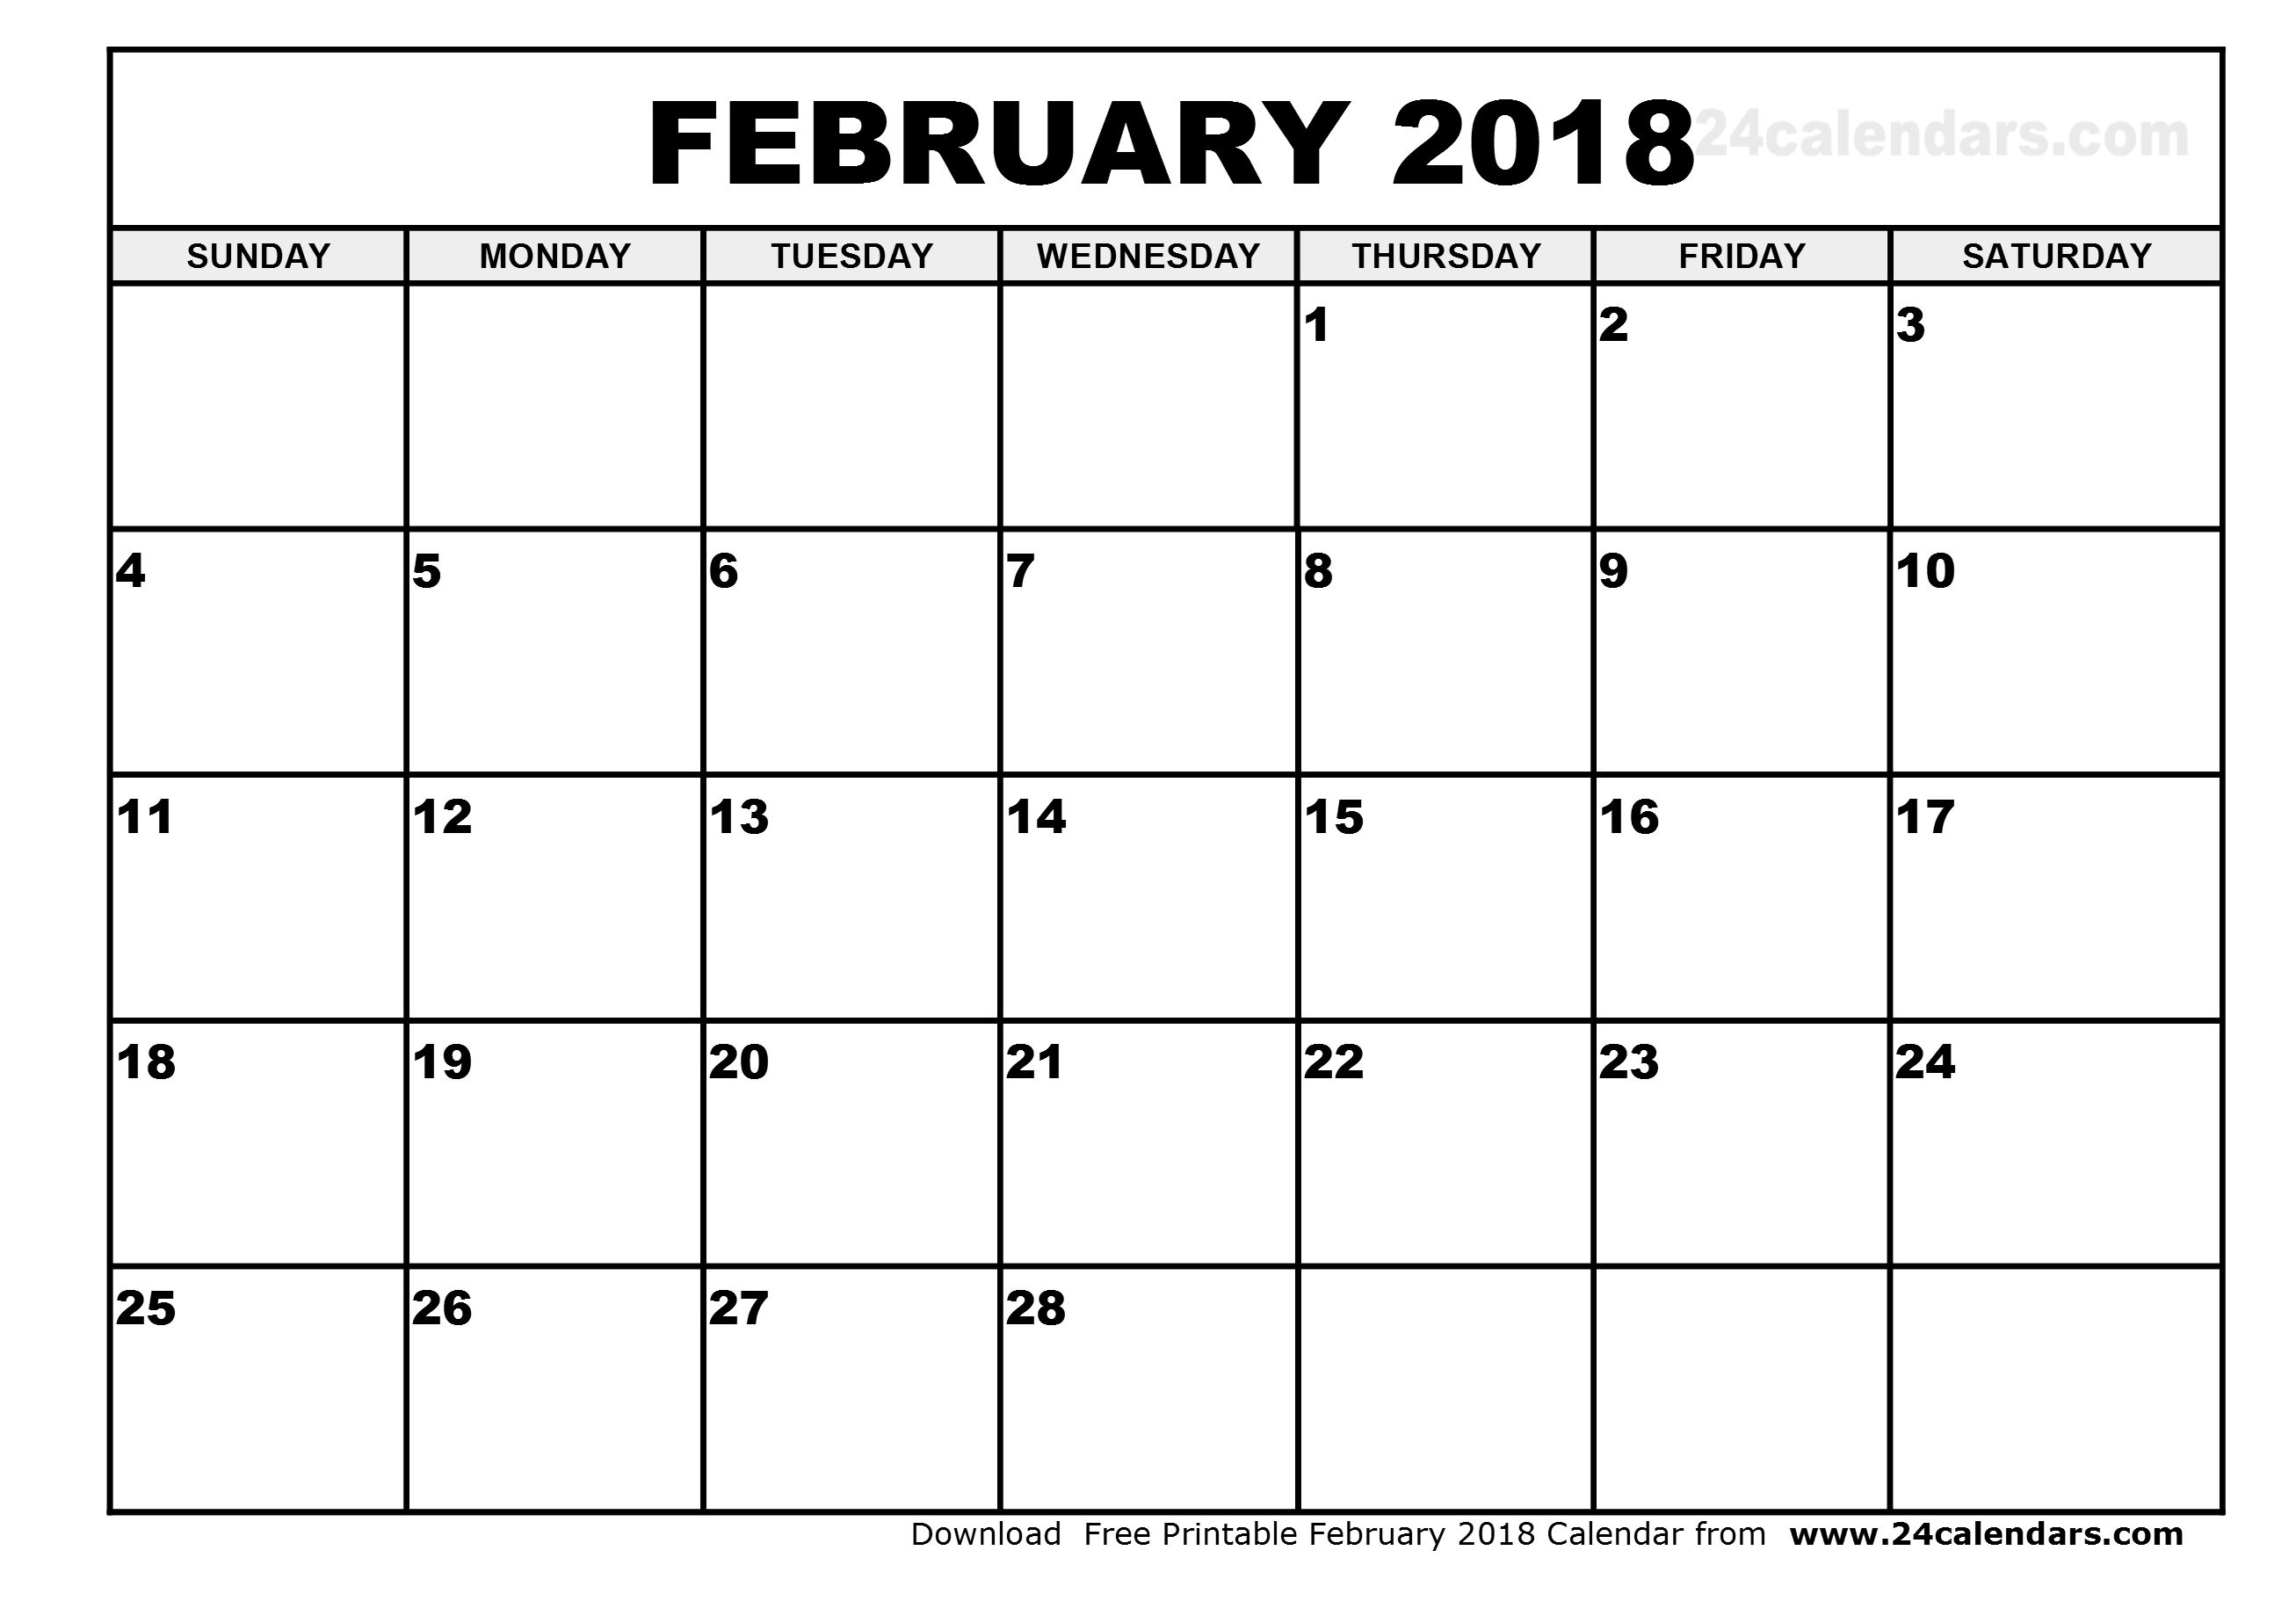 February 2018 Calendar Printable Template Pdf With Holidays Usa Uk